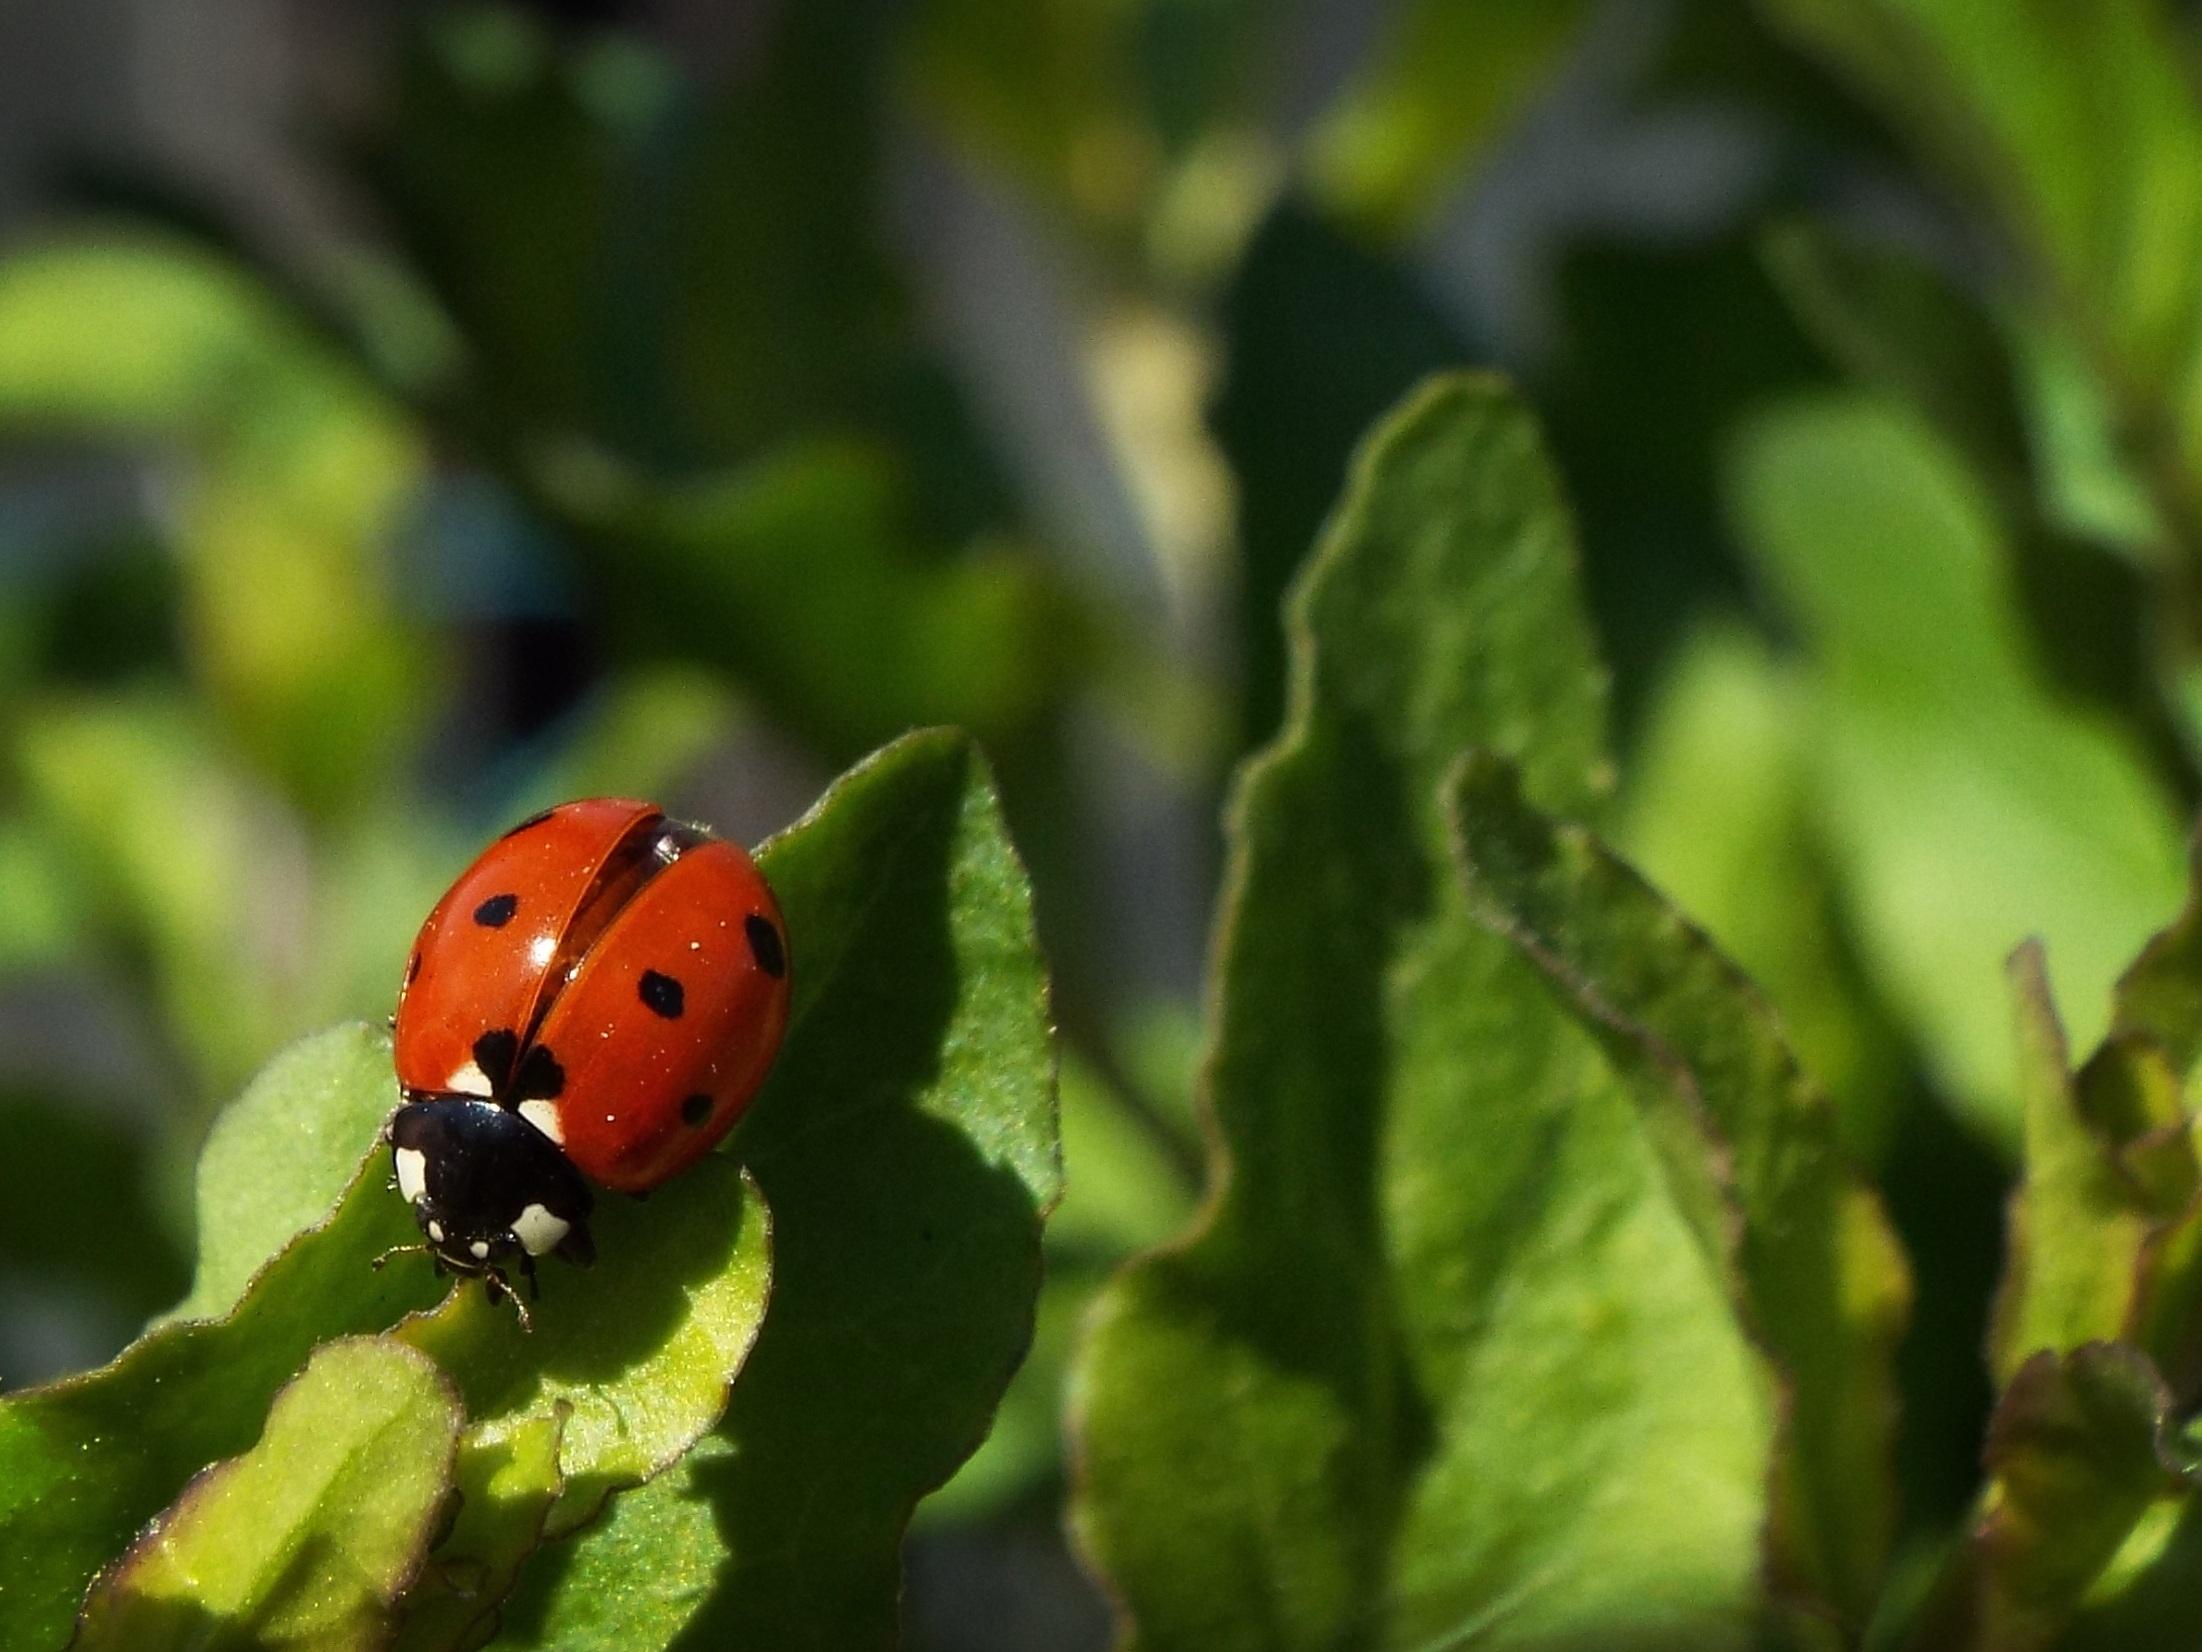 Leaf Insect Macro Ladybug Garden Ladybird Invertebrate Close Up Cool Image  Cool Photo Beetle Macro Photography